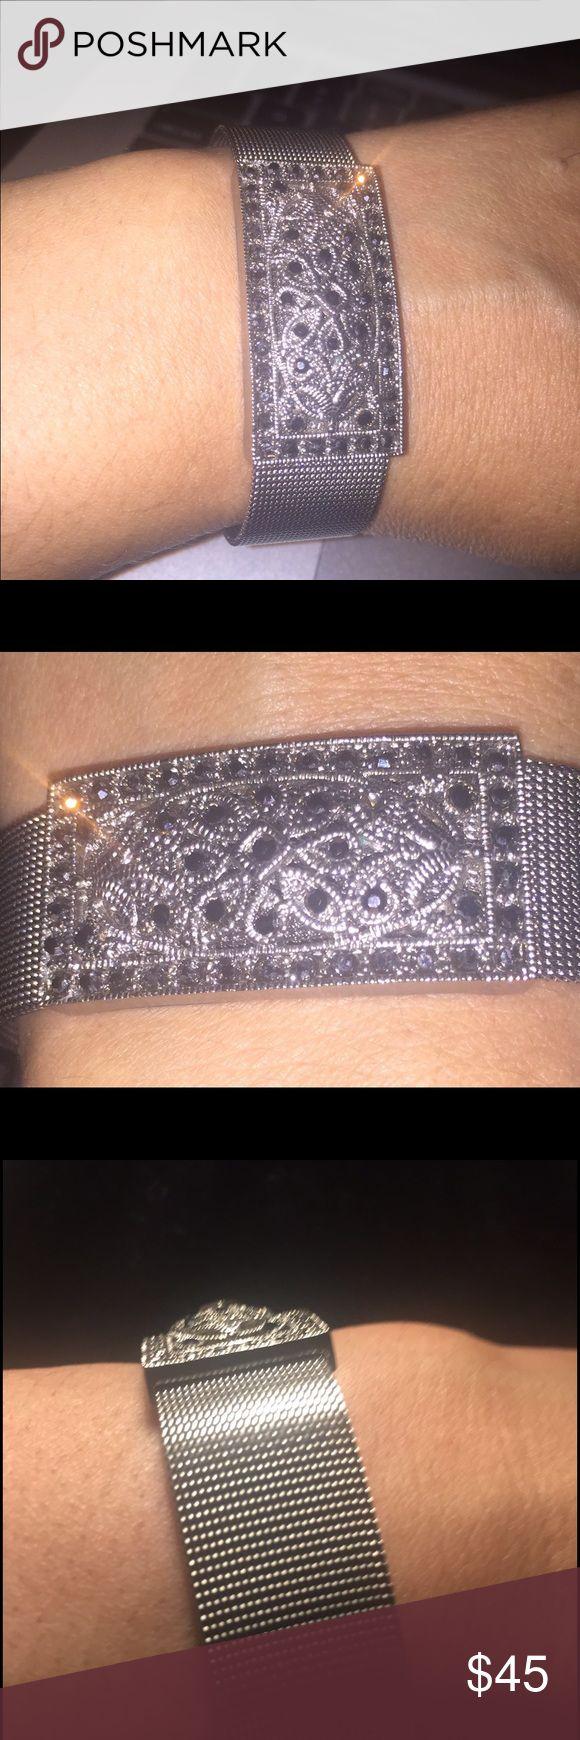 "Vintage Silver Tone Chain Mesh Bracelet Vintage Silver Tone Chain Mesh Bracelet in a Belt Style W /Black Rhinestones Incrustation in a Square  & Flower Metal shapes  ( embroidered alike ) MEASUREMENTS :  Bracelet 's Width  0.80"" & Length 9""  ( Square w/ Black Rhinestones  W .80"" x  D .20"" x  L 1.50"" ) Flaw a little bit of wear & scratch see last picture  Vintage Jewelry Bracelets"